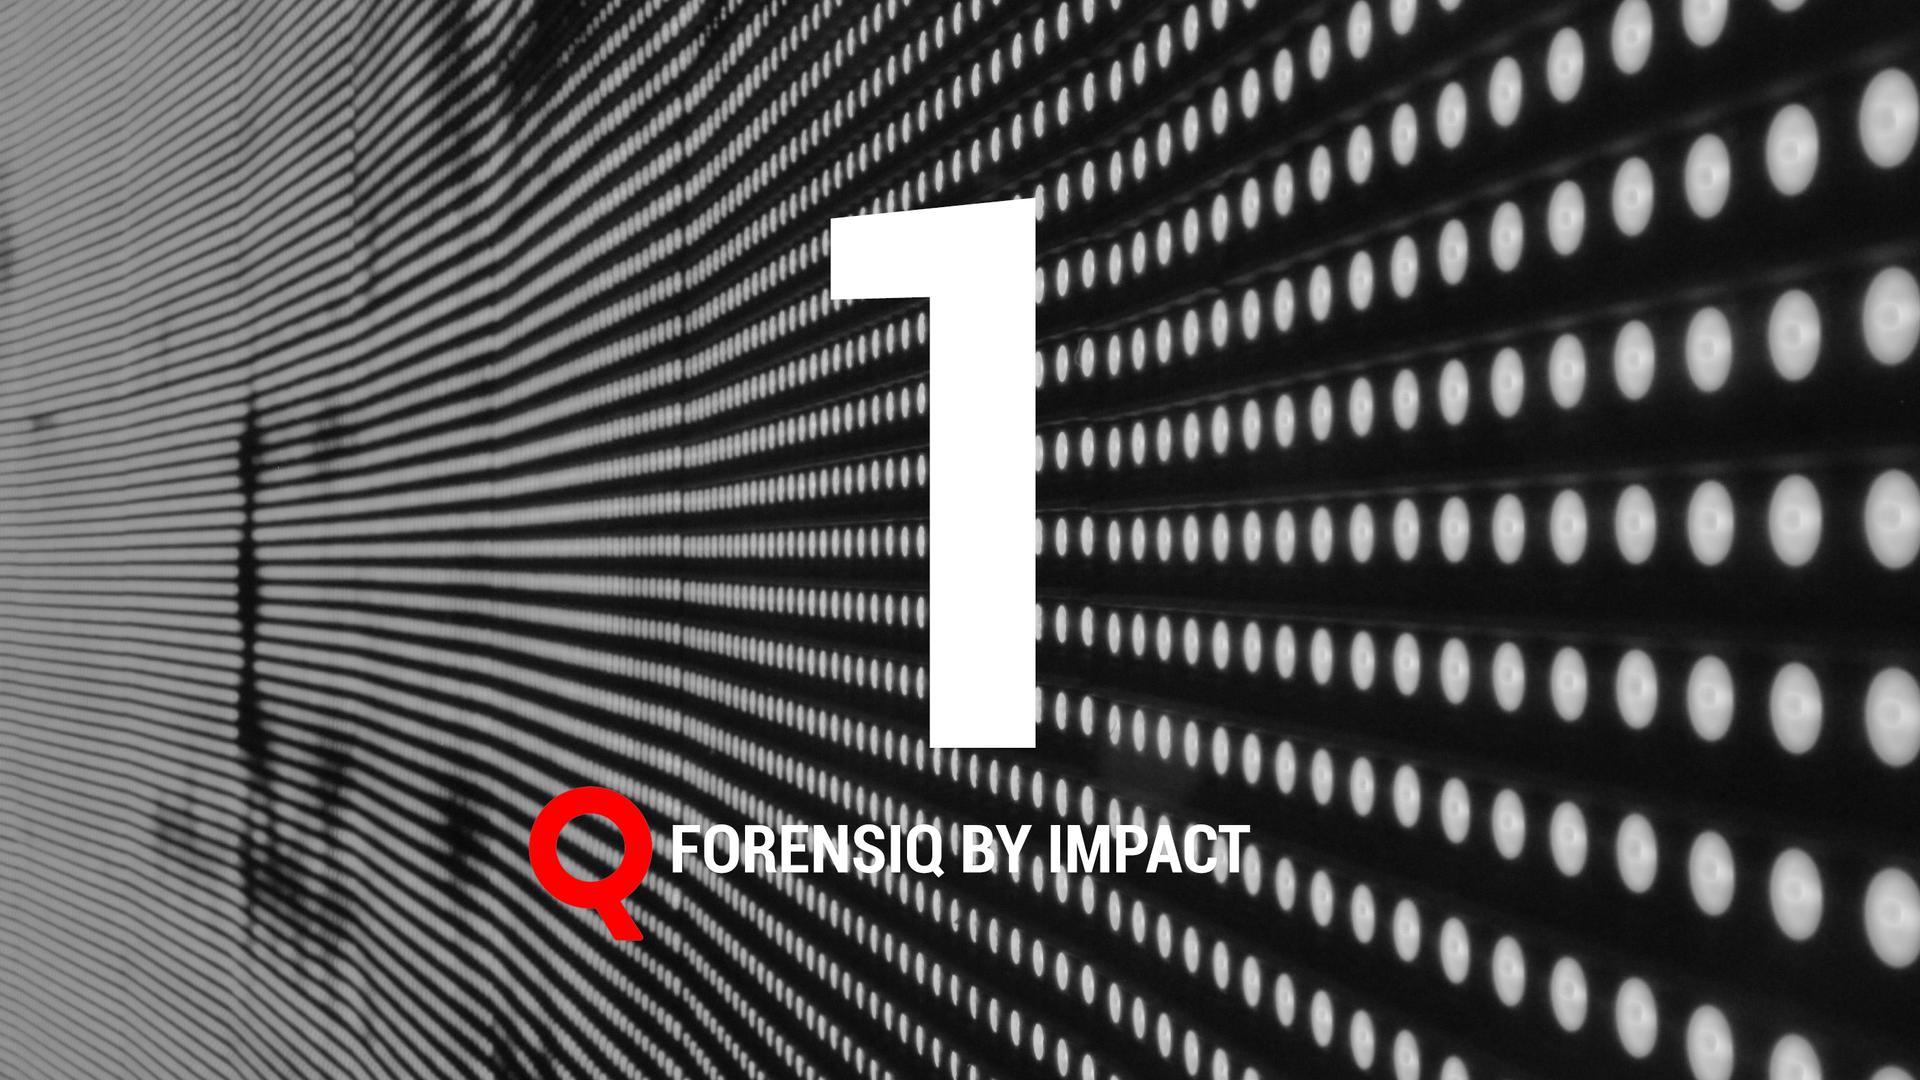 FORENSIQ BY IMPACT